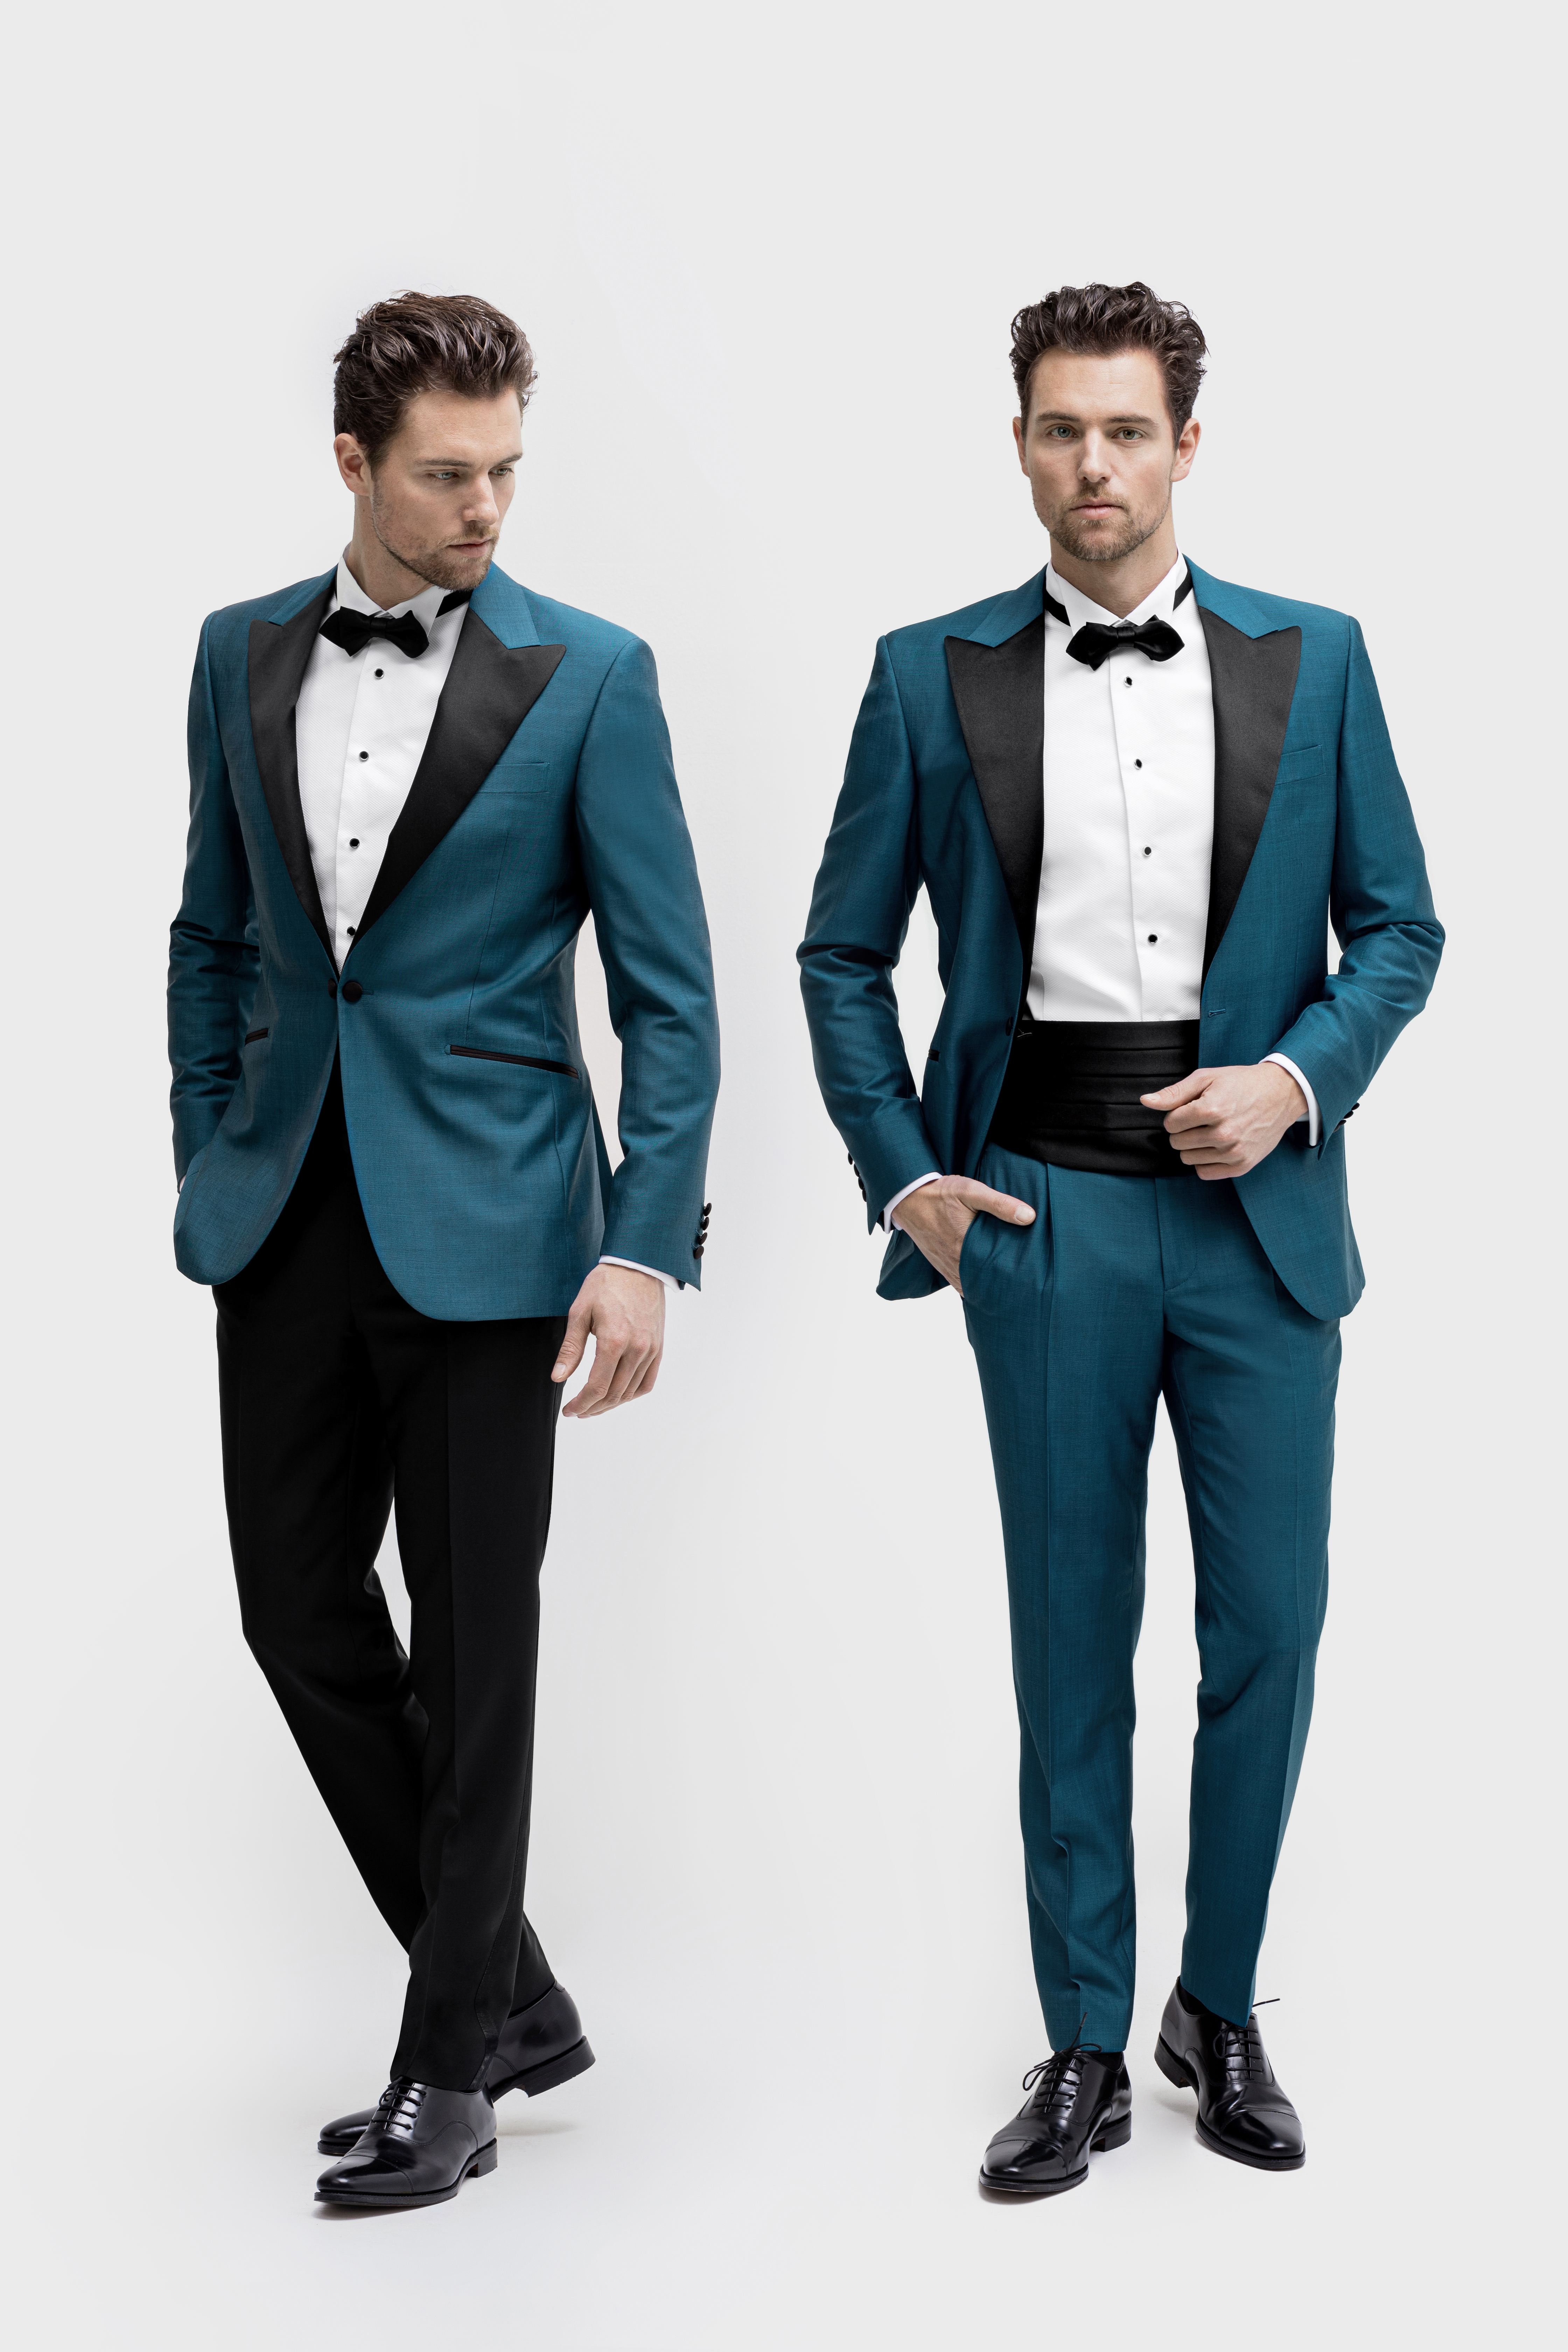 www.richardfox.co Custom Mid Blue Tuxedo